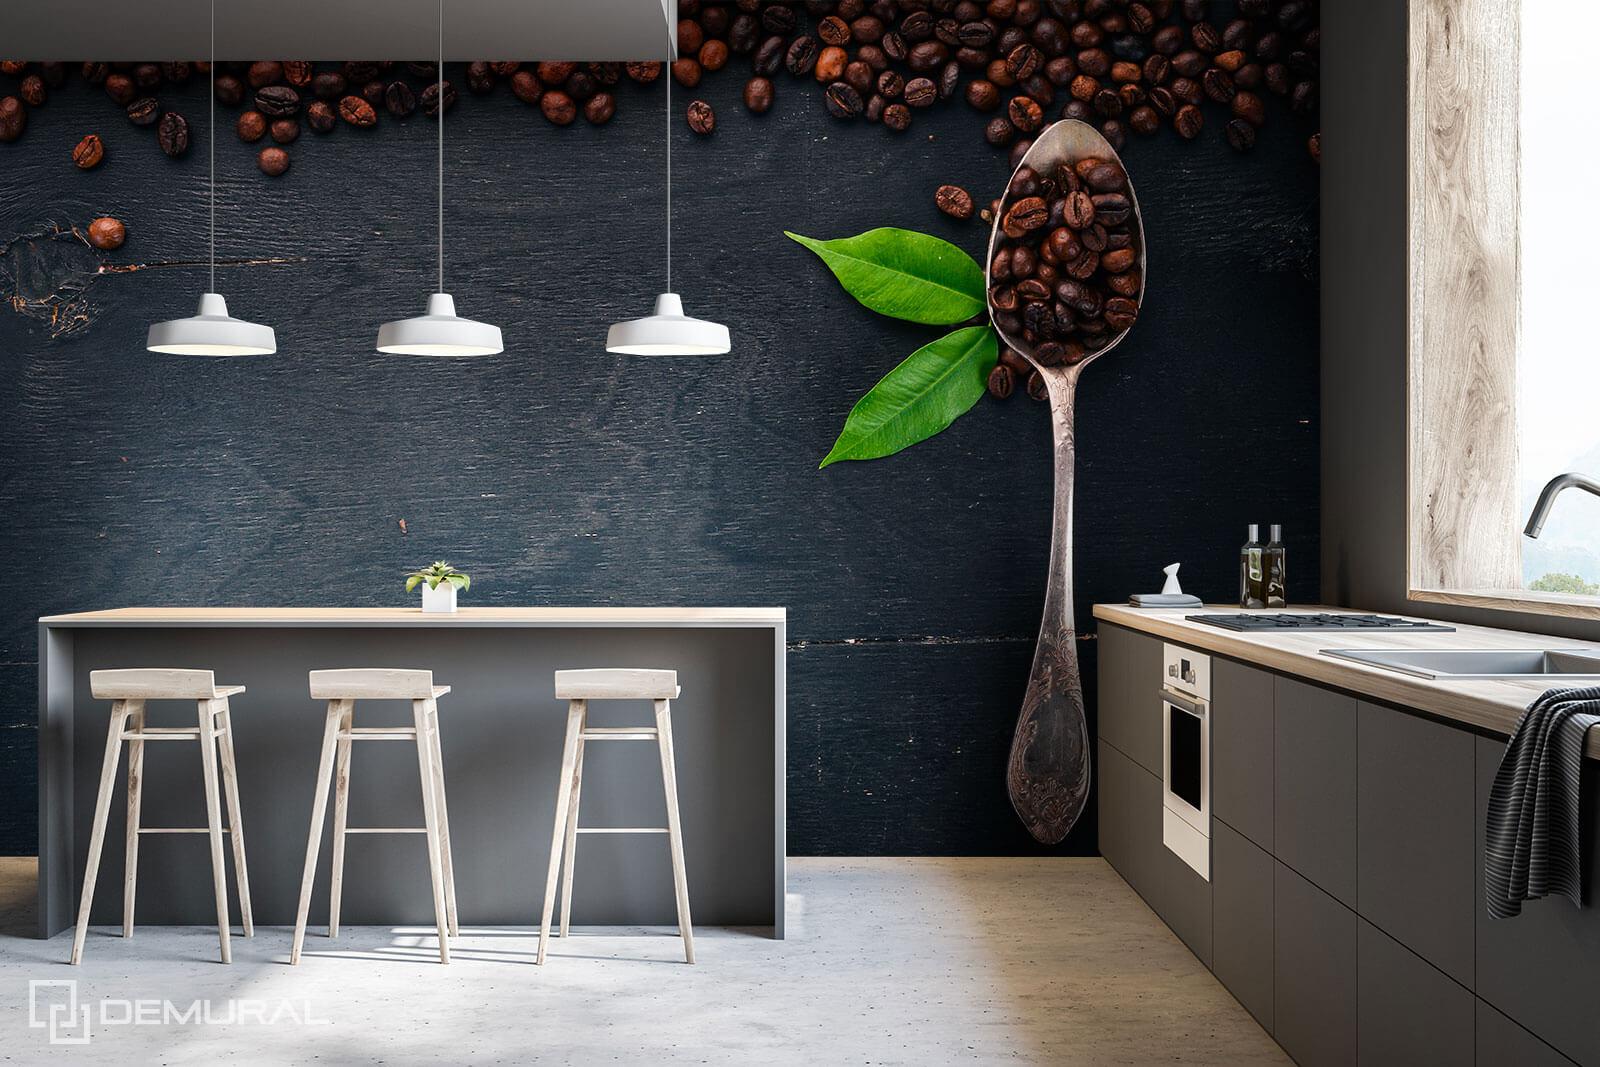 Photo wallpaper Spoon of style - Coffee Photo wallpaper - Demural